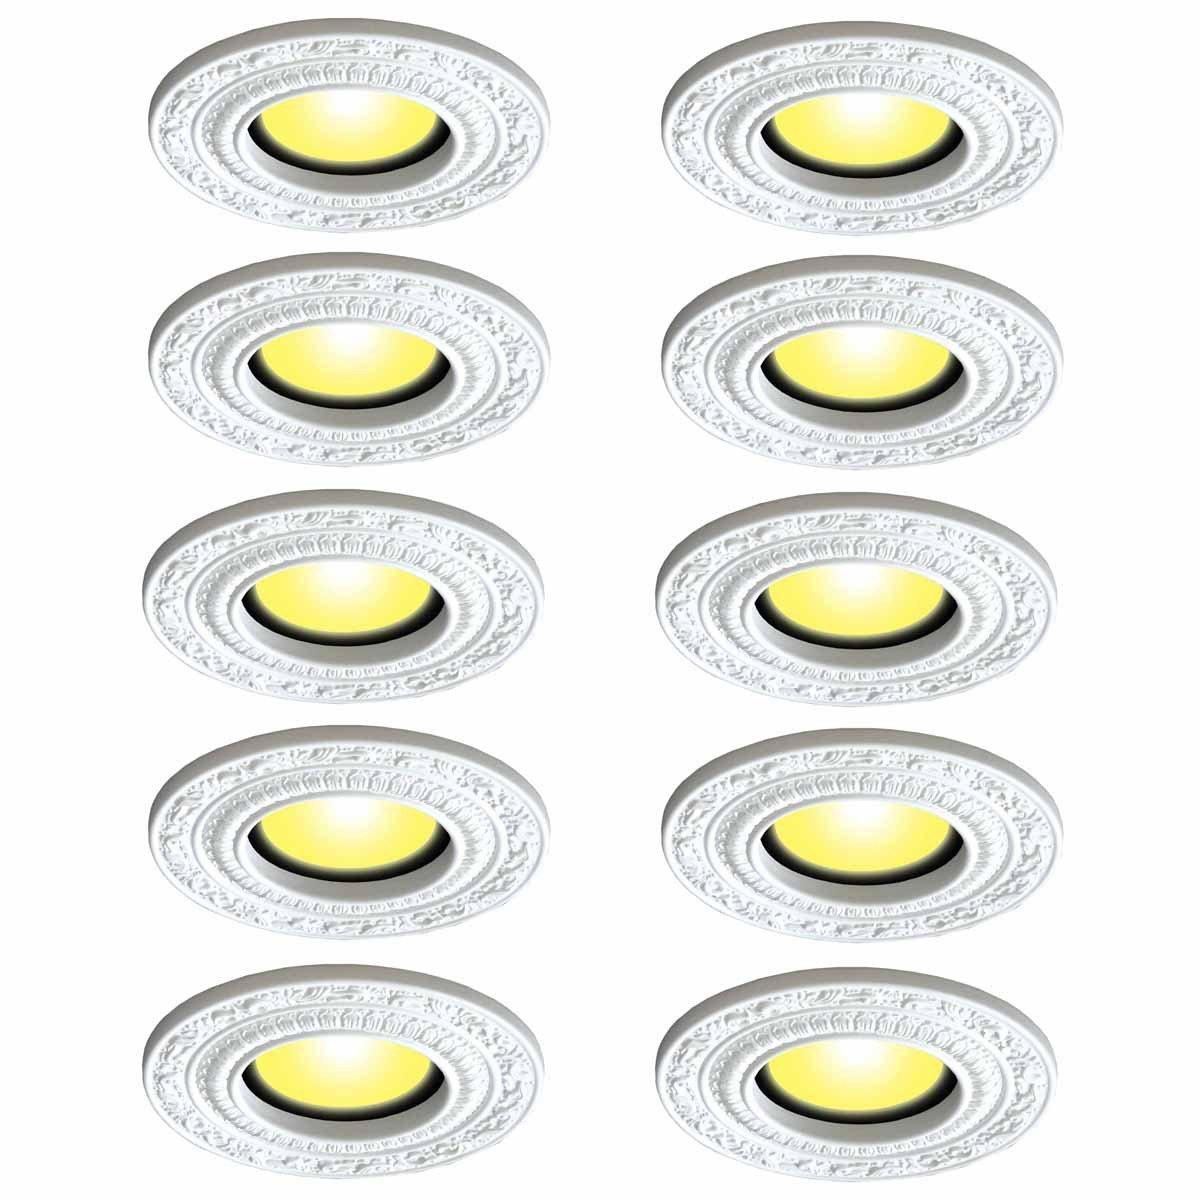 Spot Light Trim Medallions 6 Inch ID White Urethane Set Of 10 | Renovator's Supply